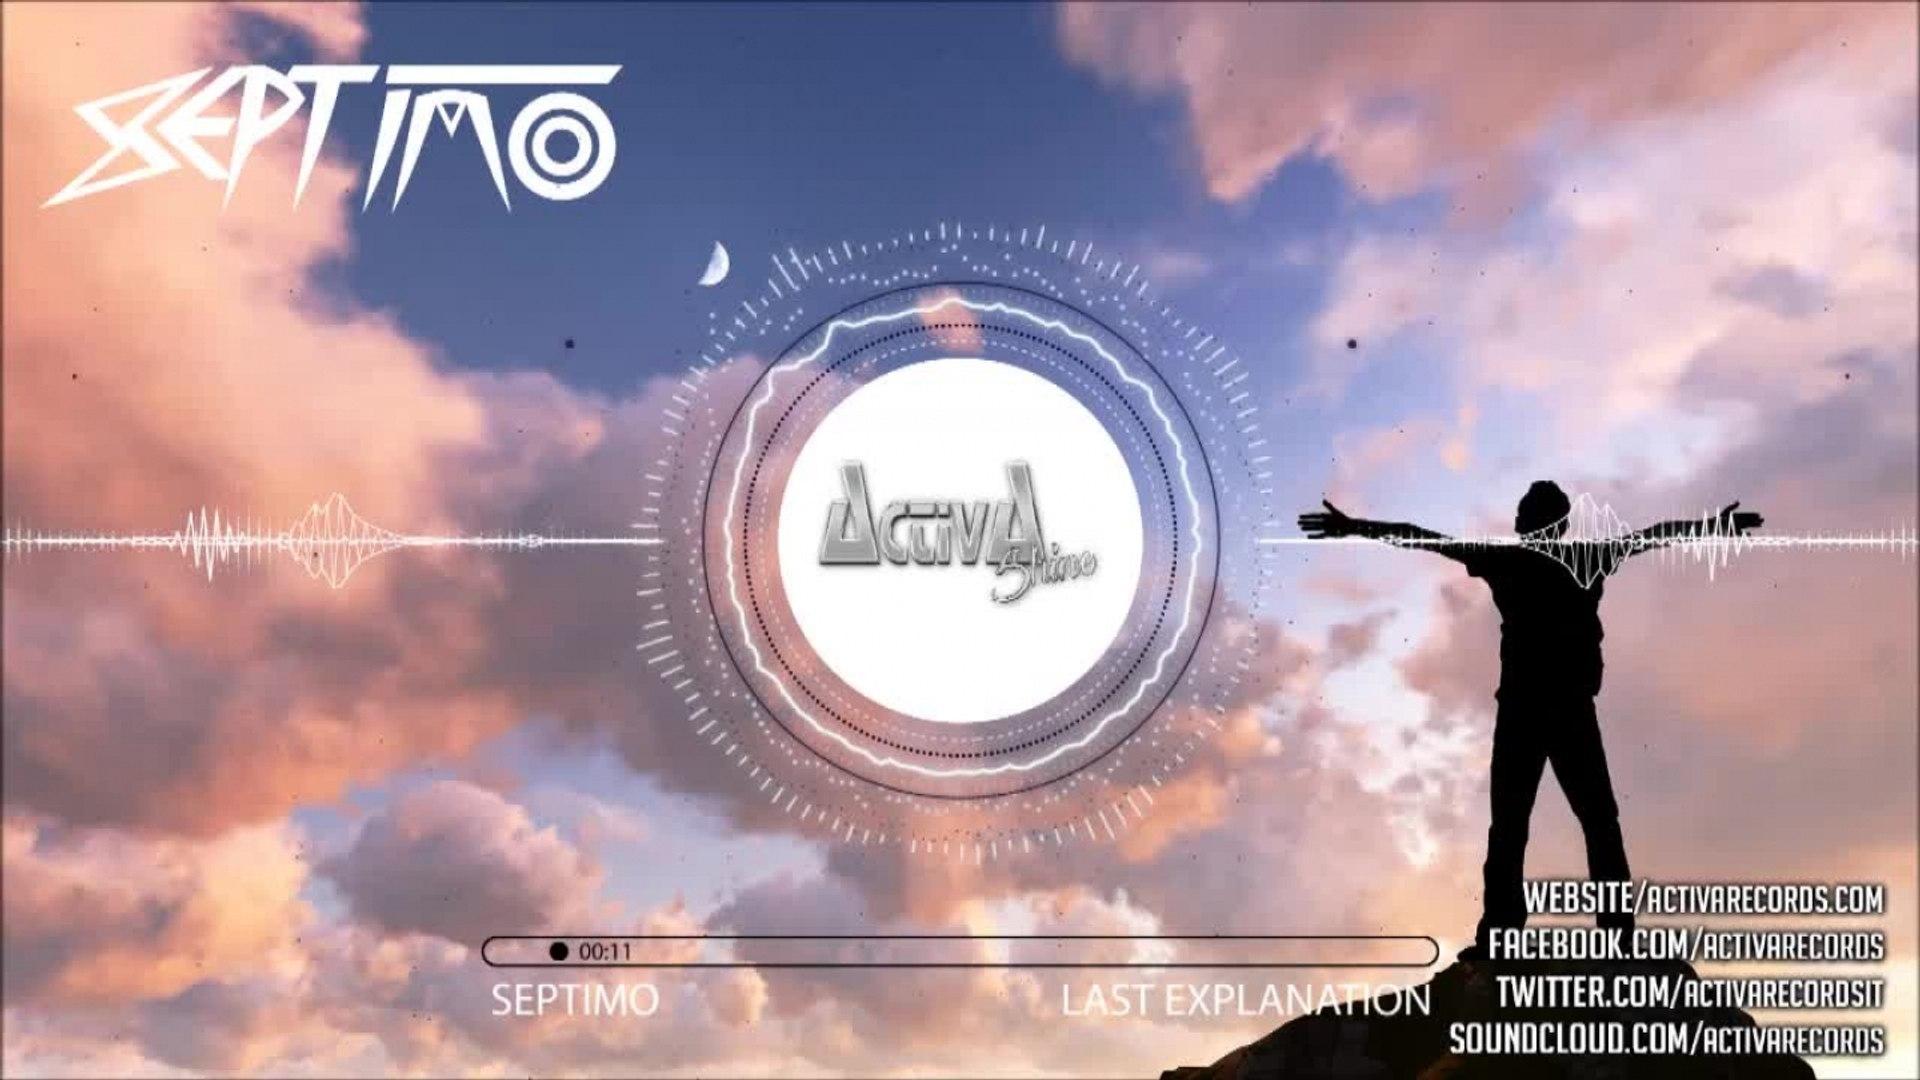 Septimo - Last Explanation (Original Mix) - Official Preview (Activa Shine)